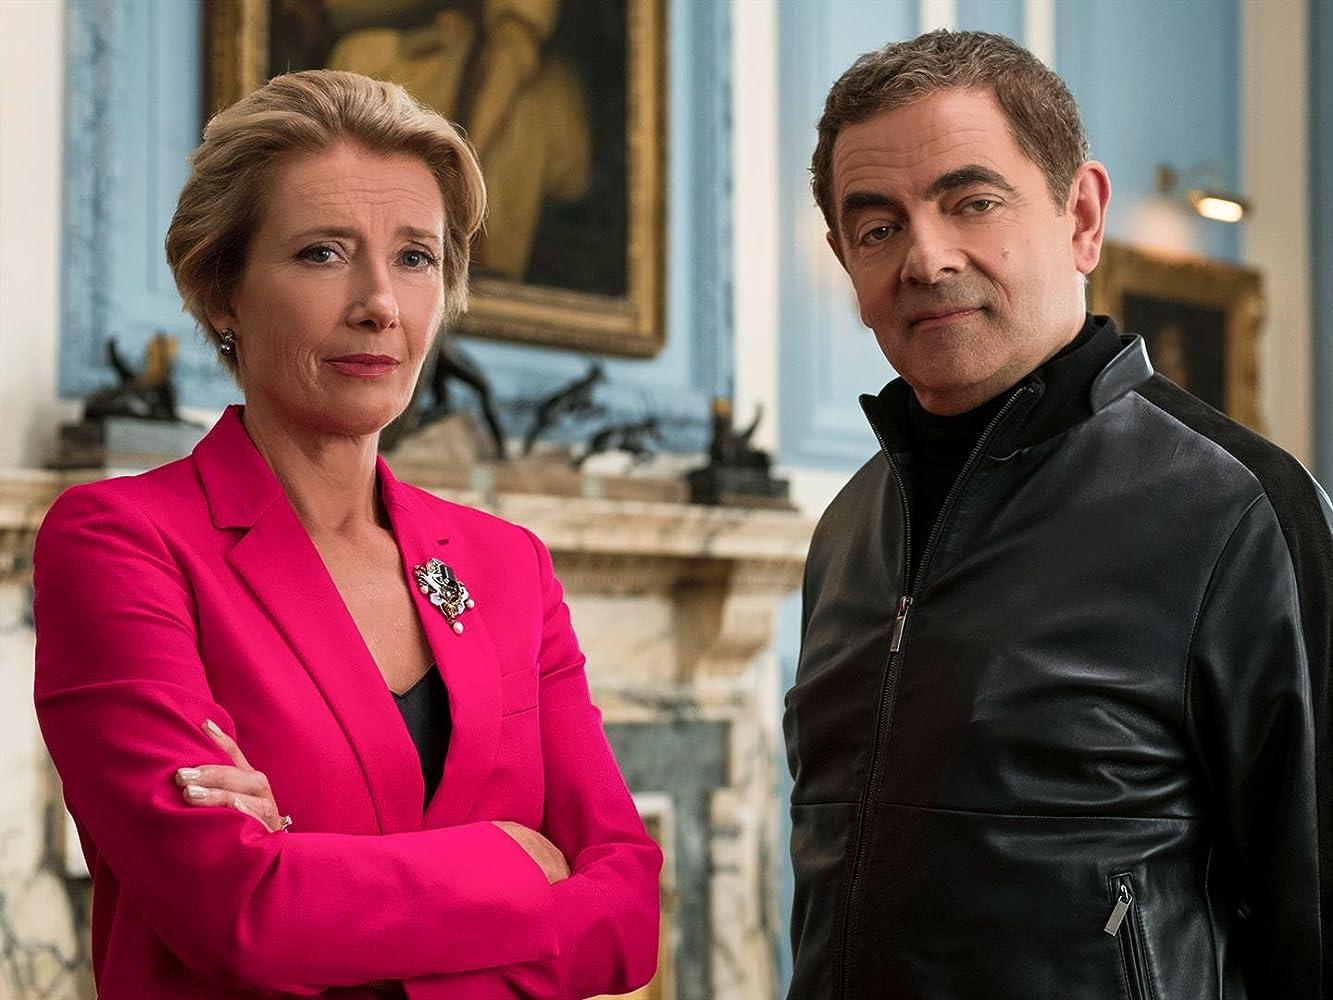 Rowan Atkinson and Emma Thompson in Johnny English Strikes Again (2018)